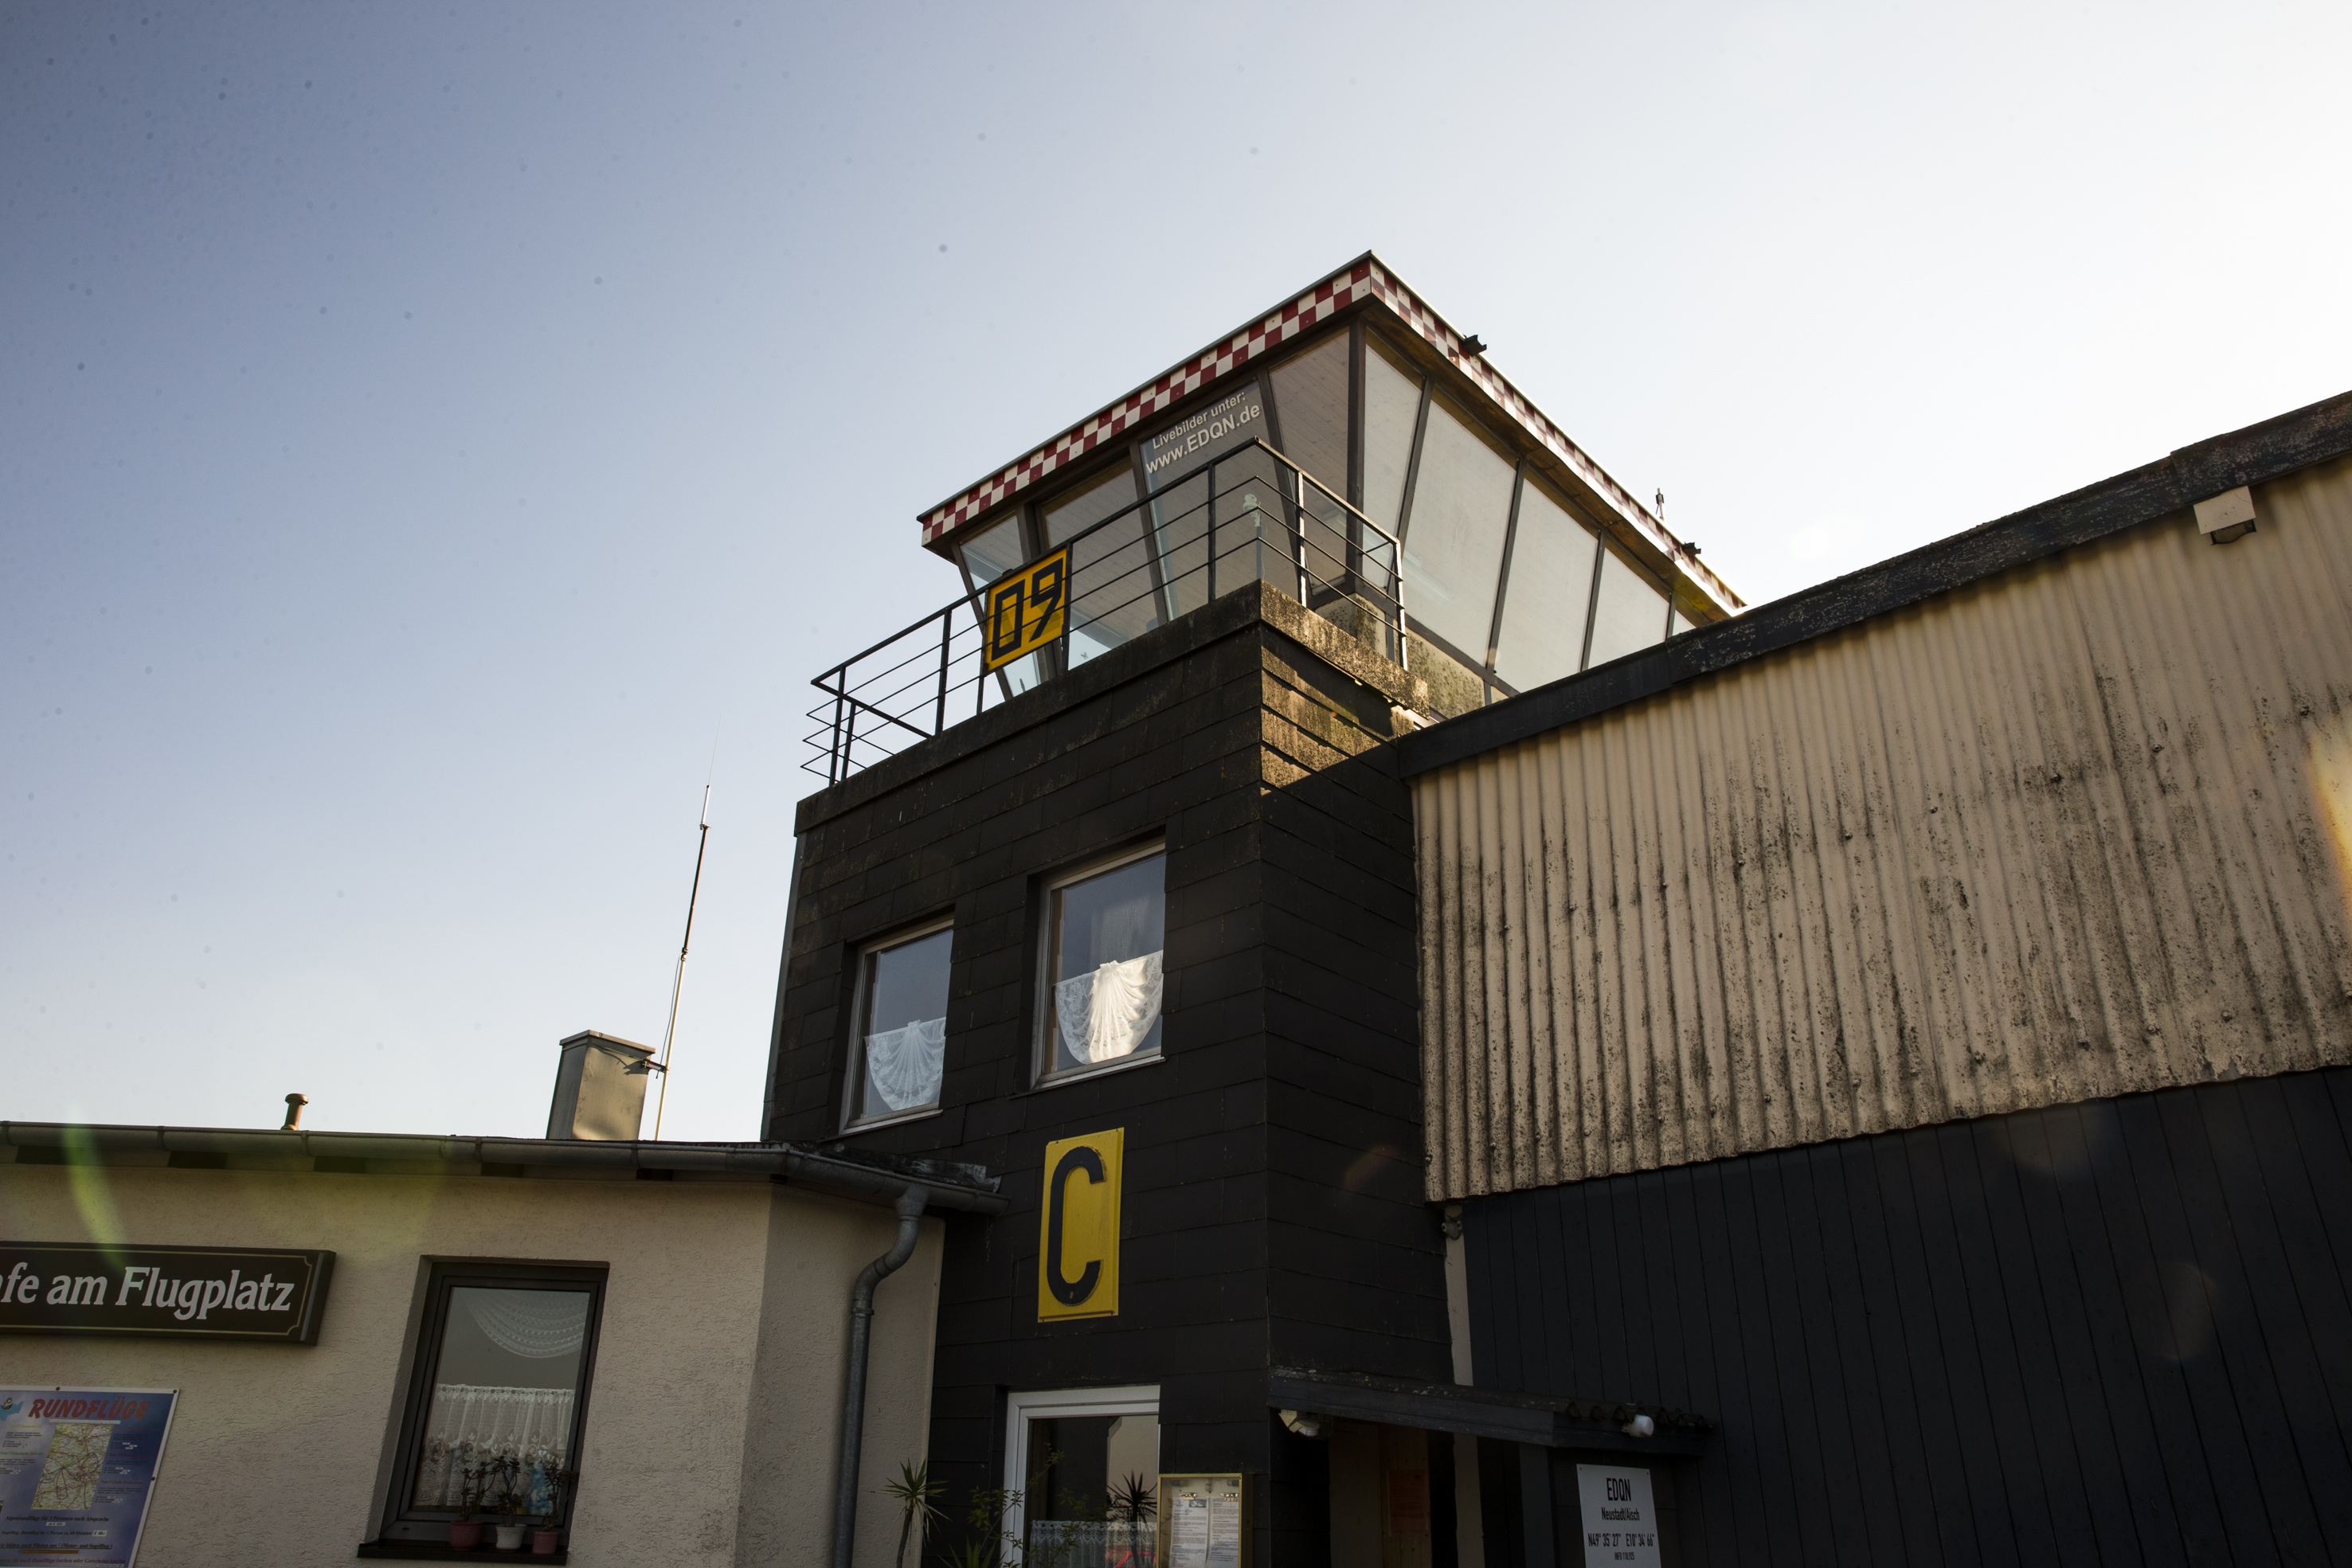 Der Tower der Flugsportgruppe Neustadt an der Aisch.